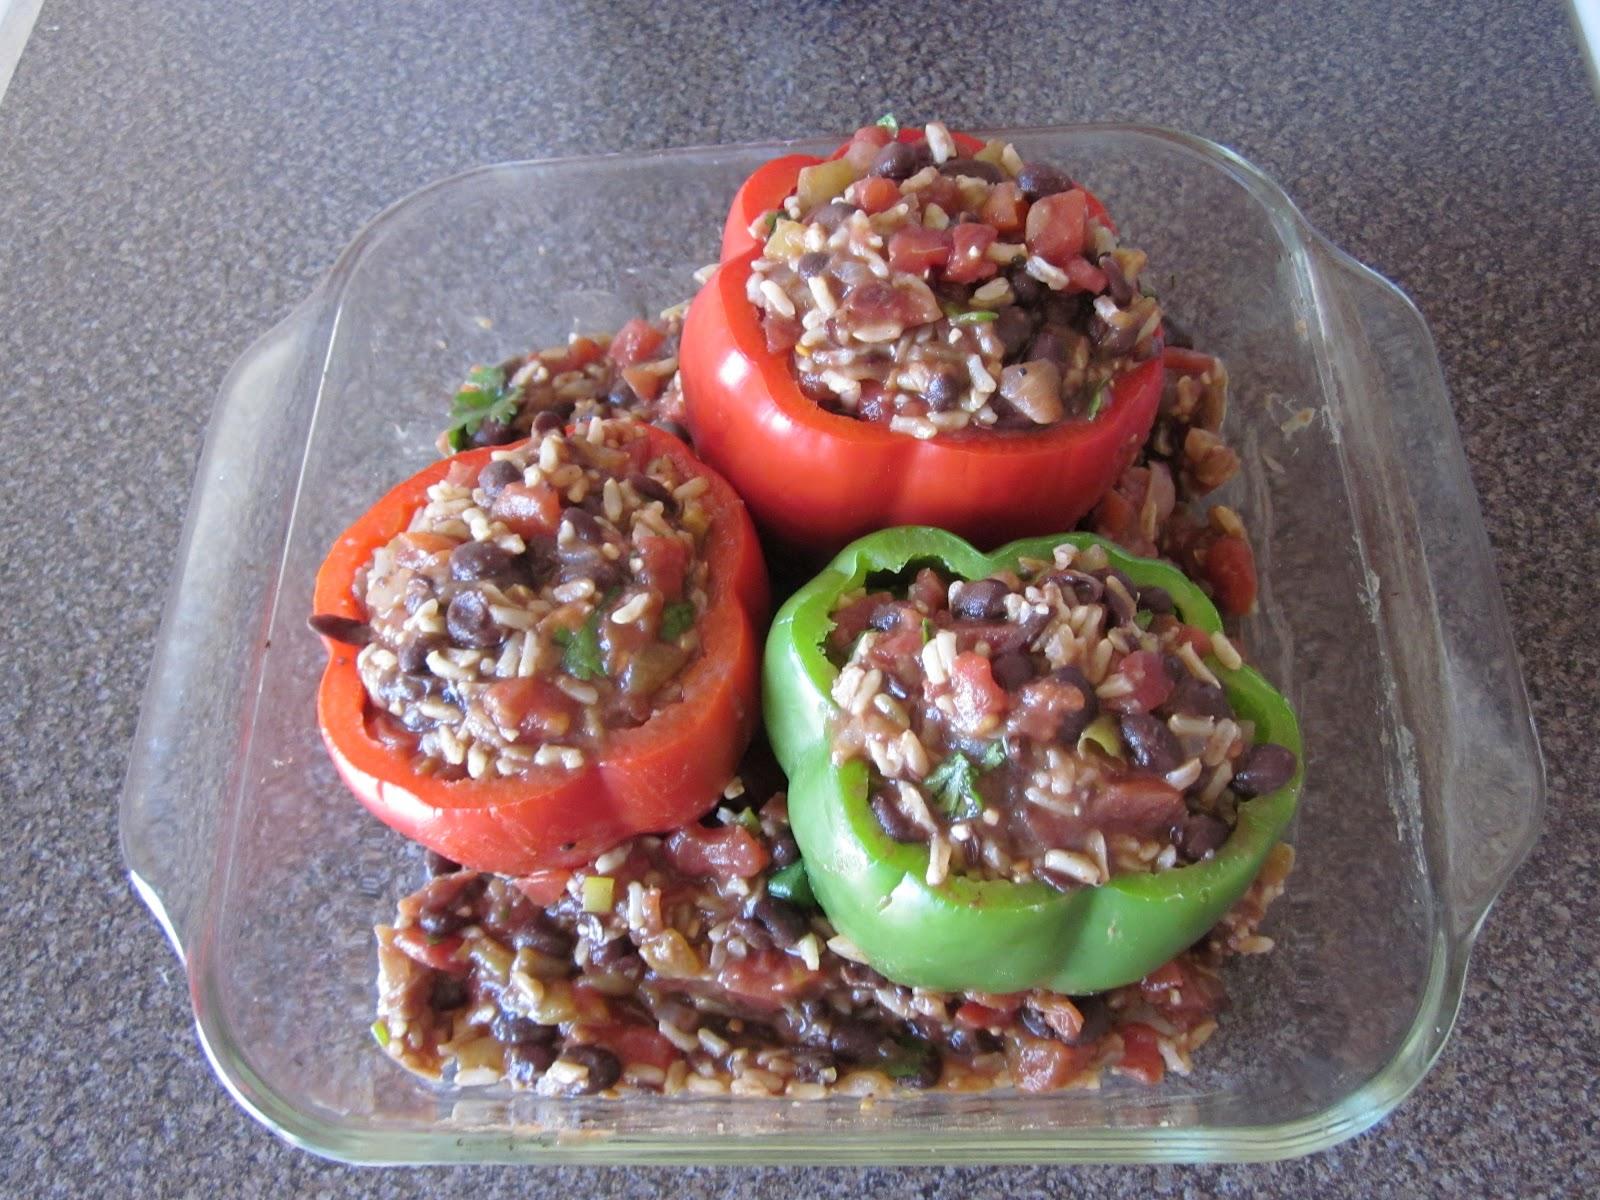 Feeling Good Through Food: Southwest Stuffed Bell Peppers